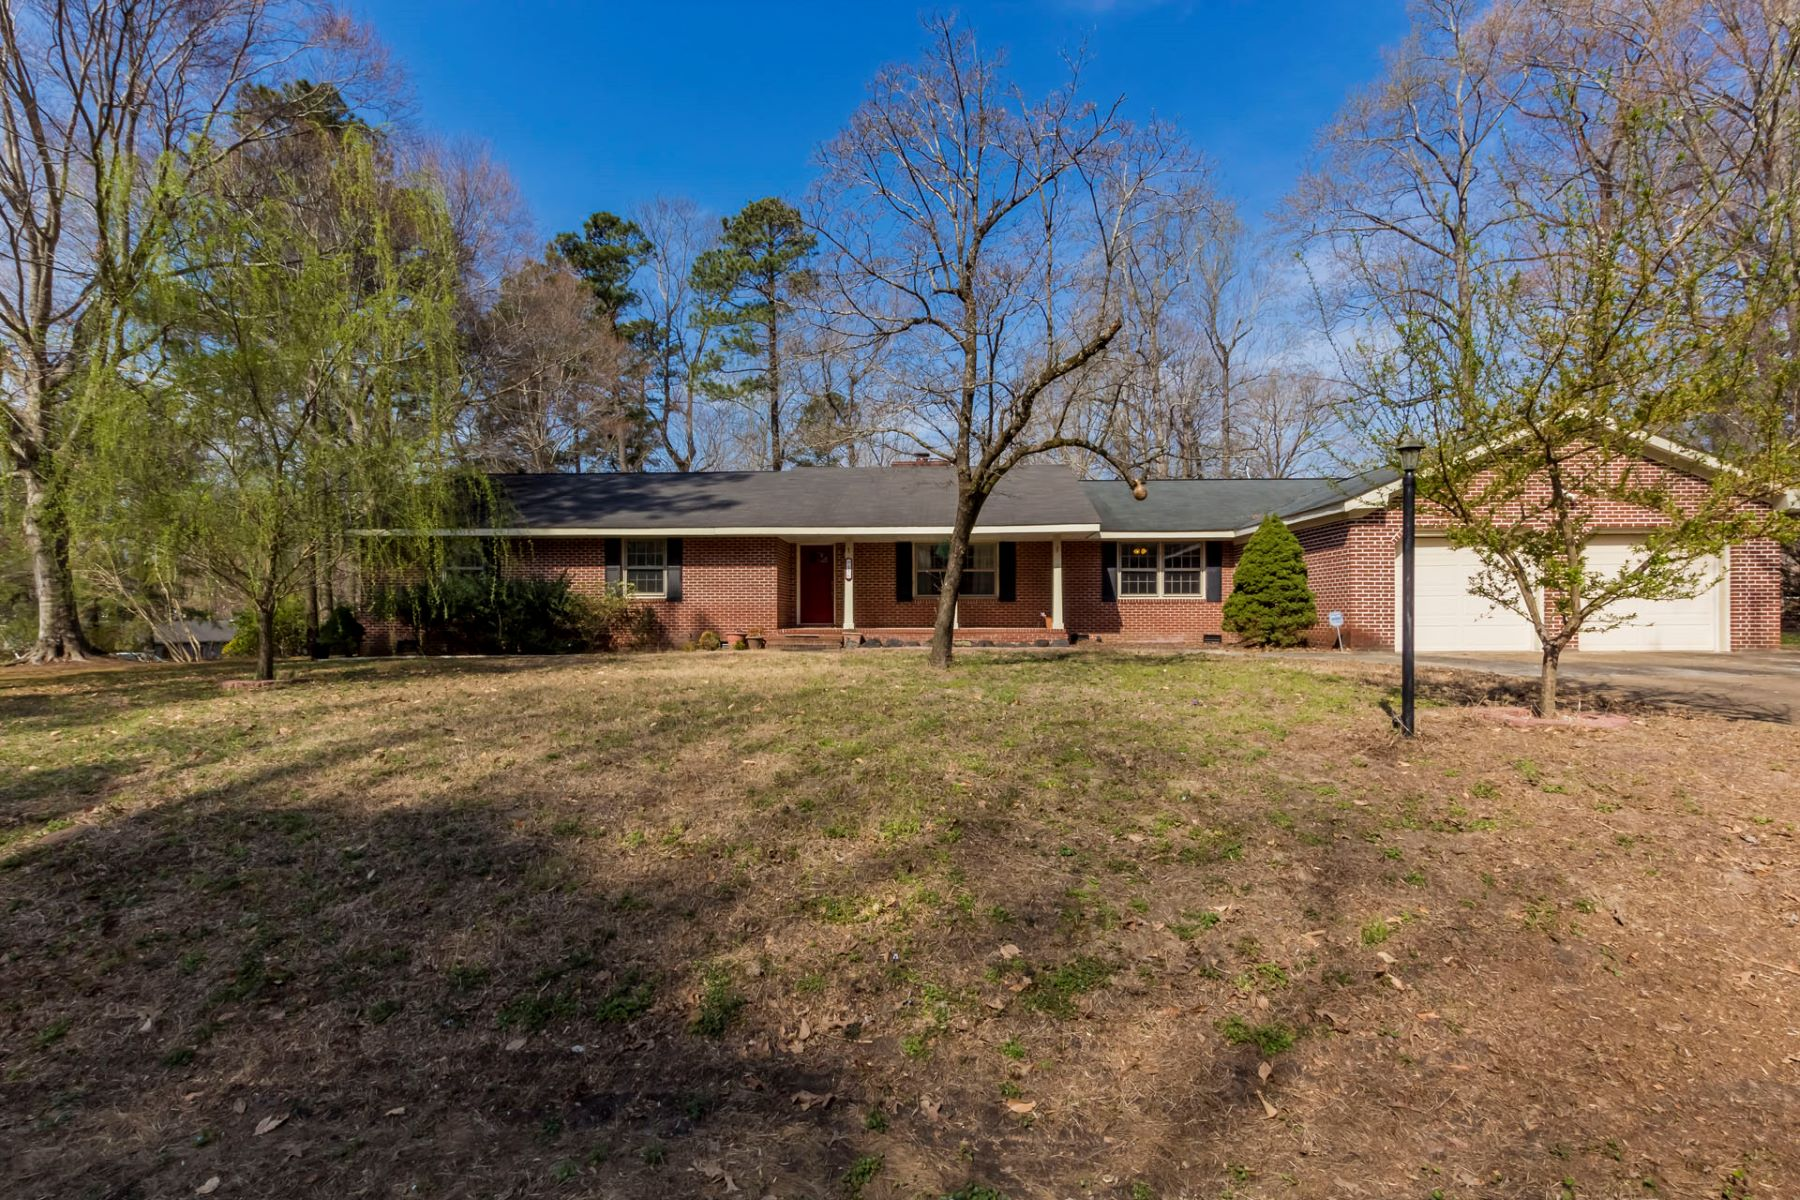 Single Family Home for Sale at POPLAR HALL PLANTATION 156 Indian Circle Williamsburg, Virginia 23185 United States